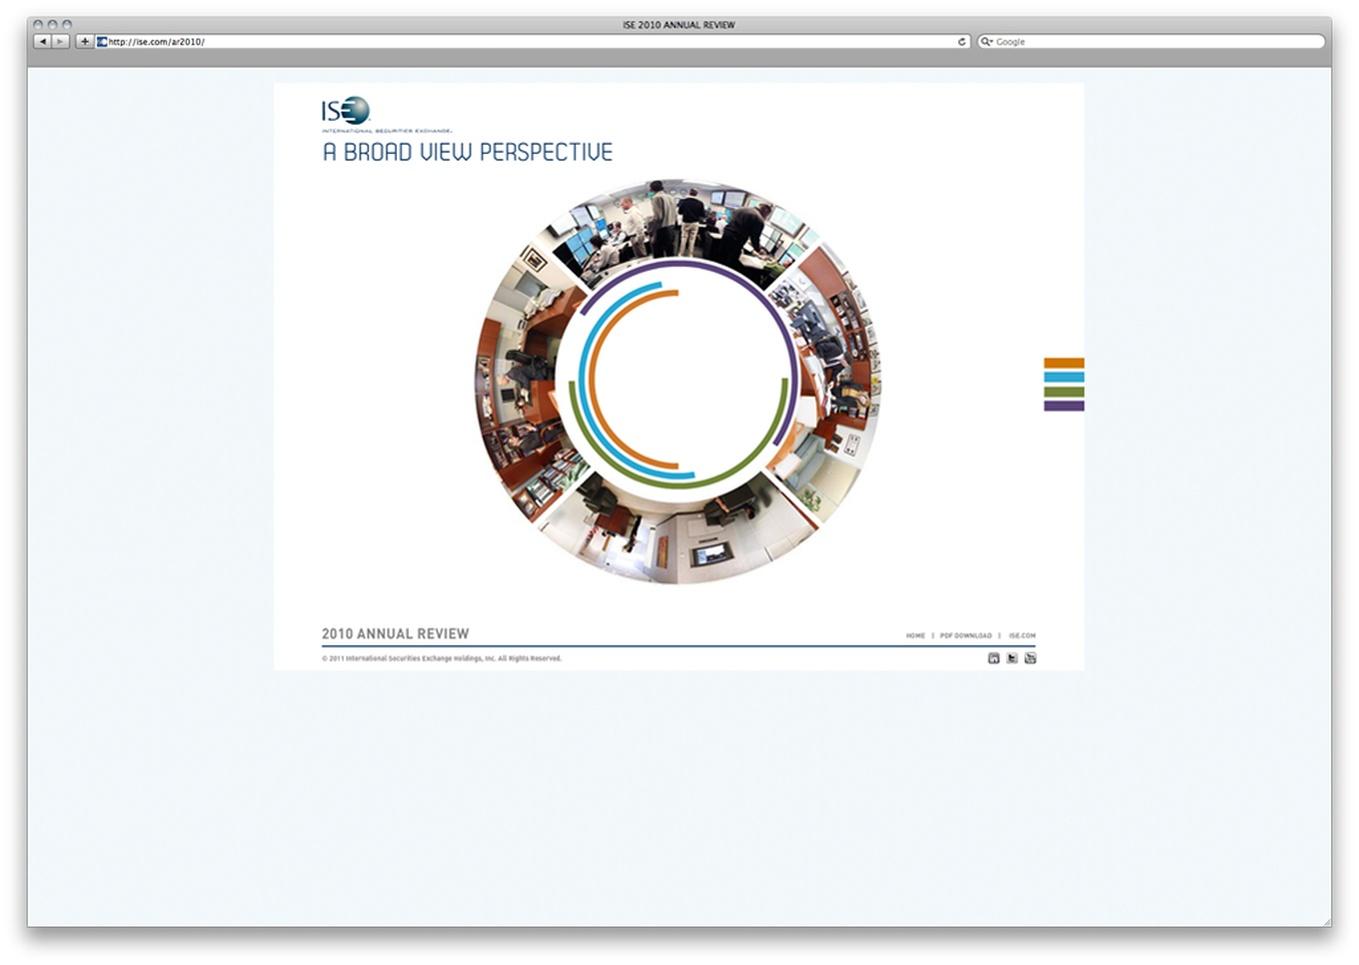 International Securities Exchanget 2010 Interactive Annual